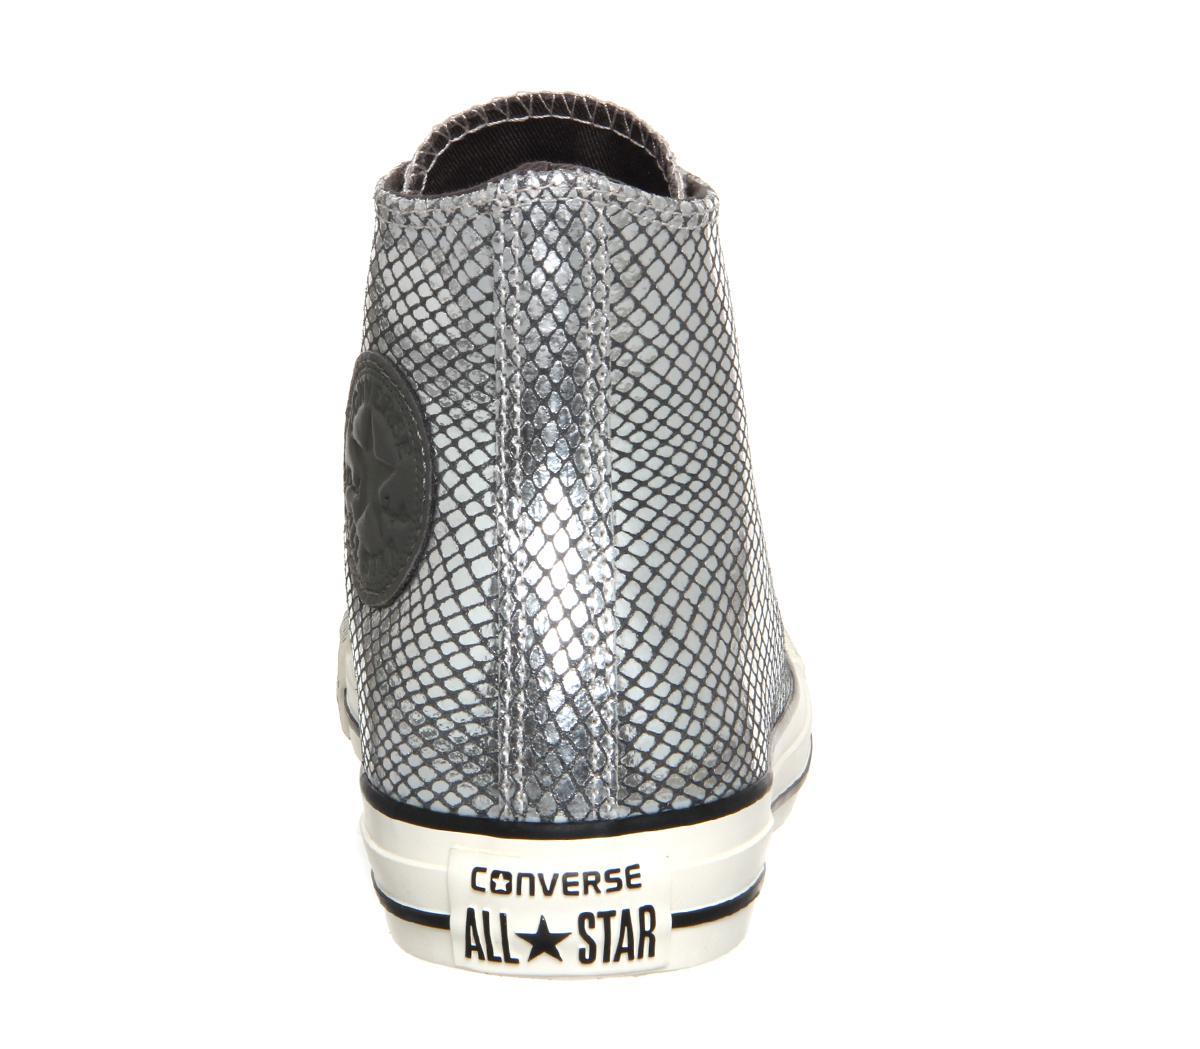 Converse Rubber All Star Hi Lthr in Grey (Grey) for Men